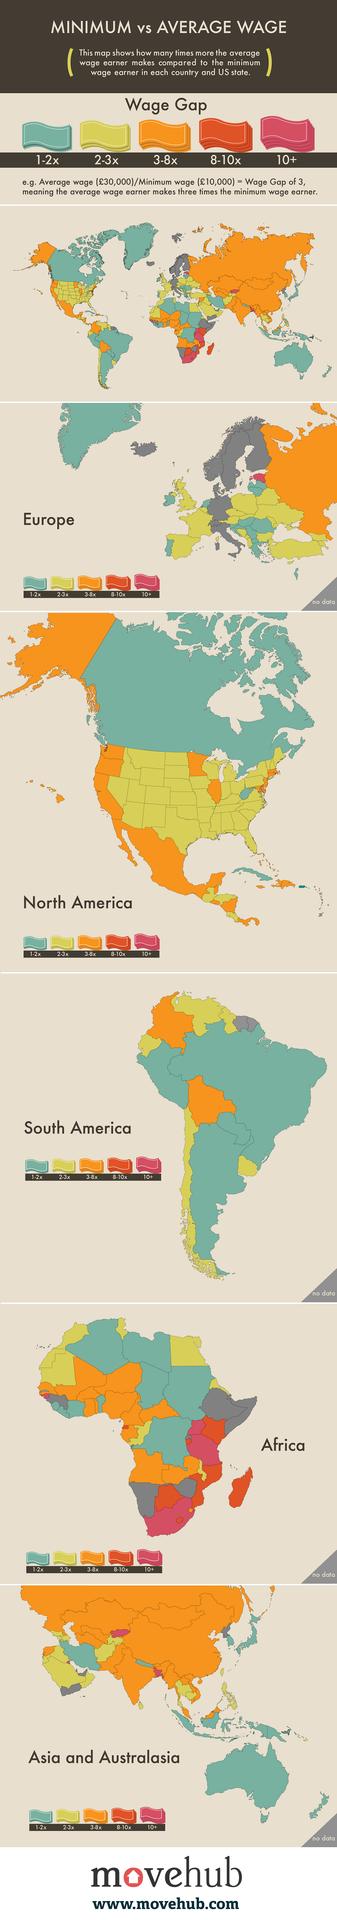 Minimum V Average Global Wage Gap Map On The Web World Geography Dissertation Wmu